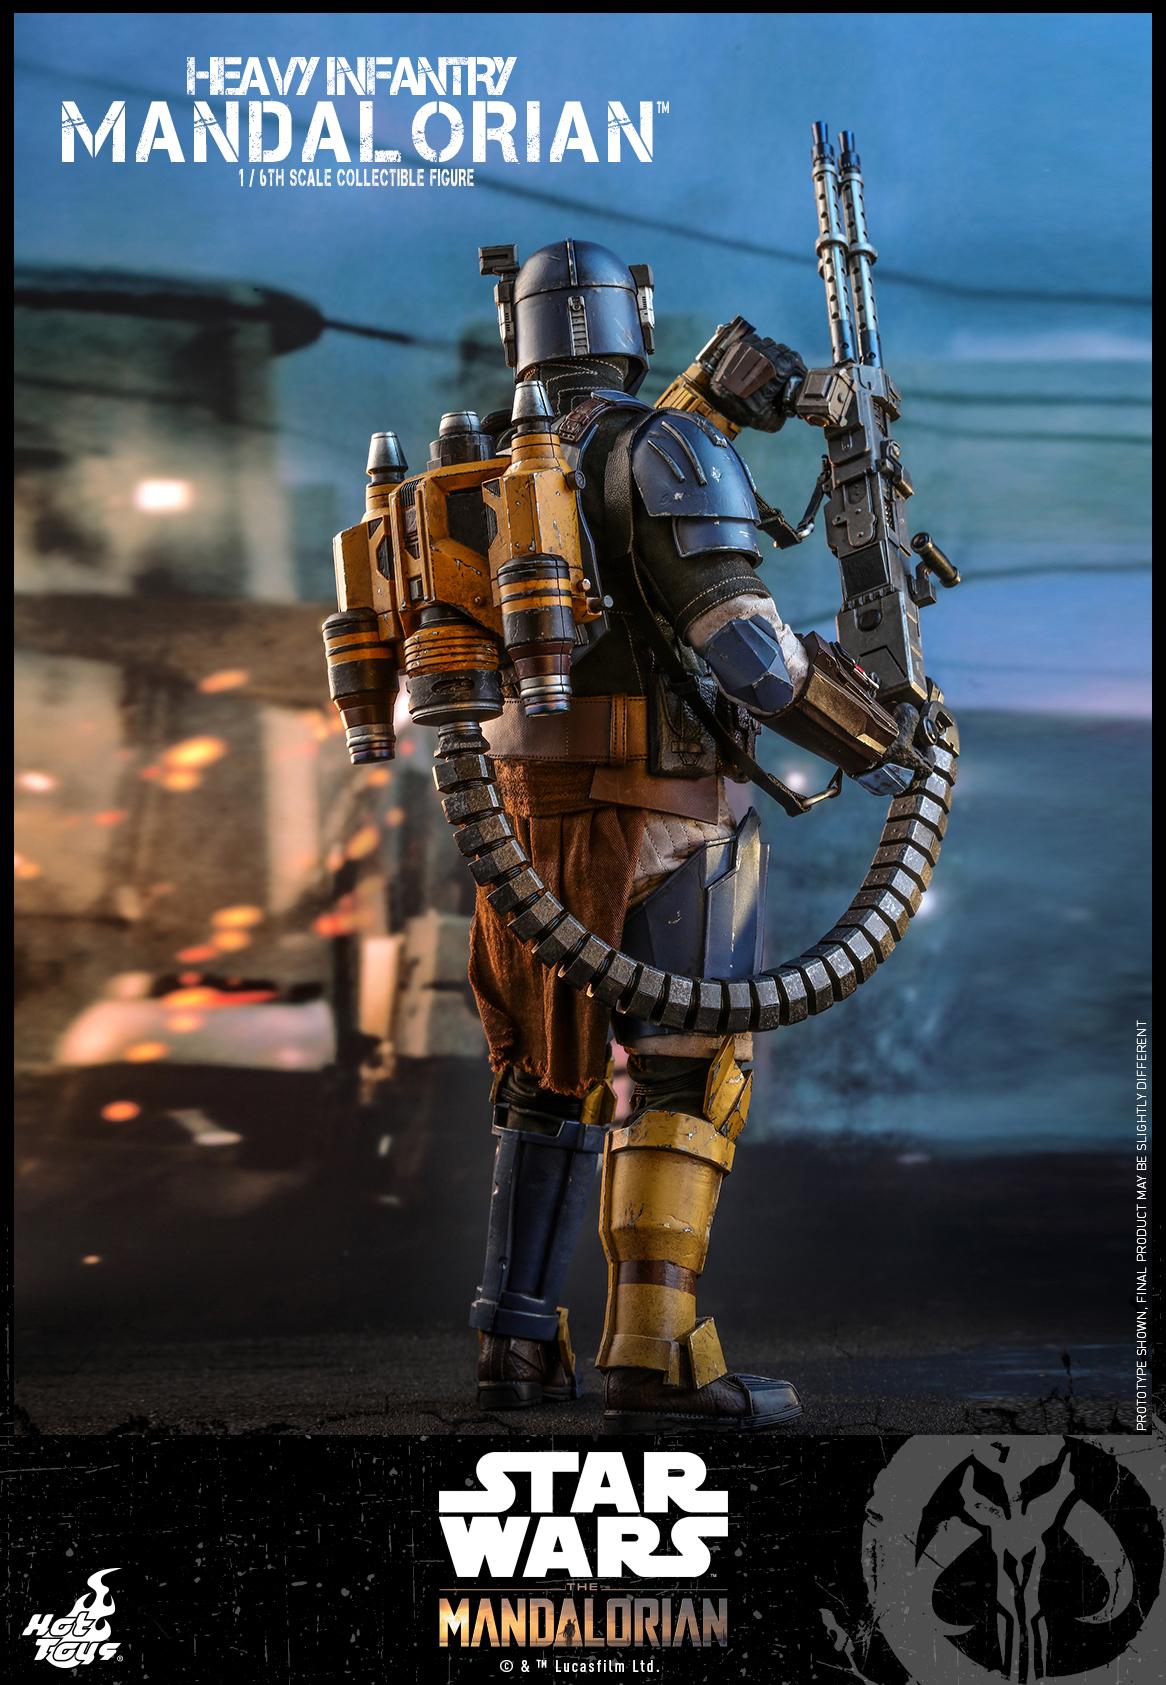 Hot Toys - SW The Mandalorian - Heavy Infantry Mandalorian_PR3